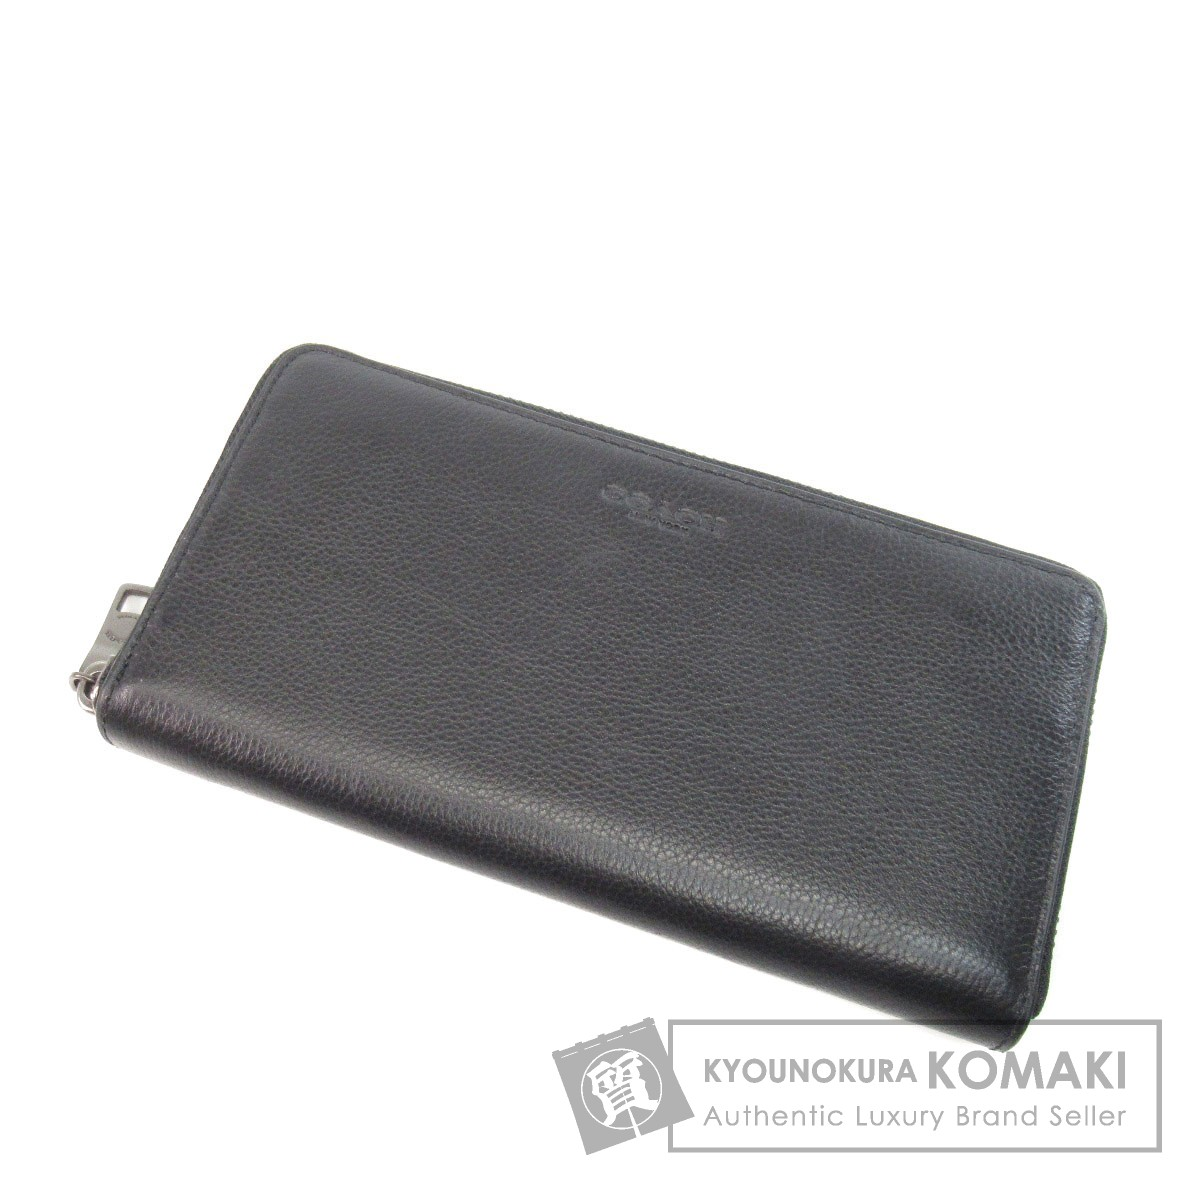 COACH F58102 長財布(小銭入れあり) レザー レディース 【中古】【コーチ】